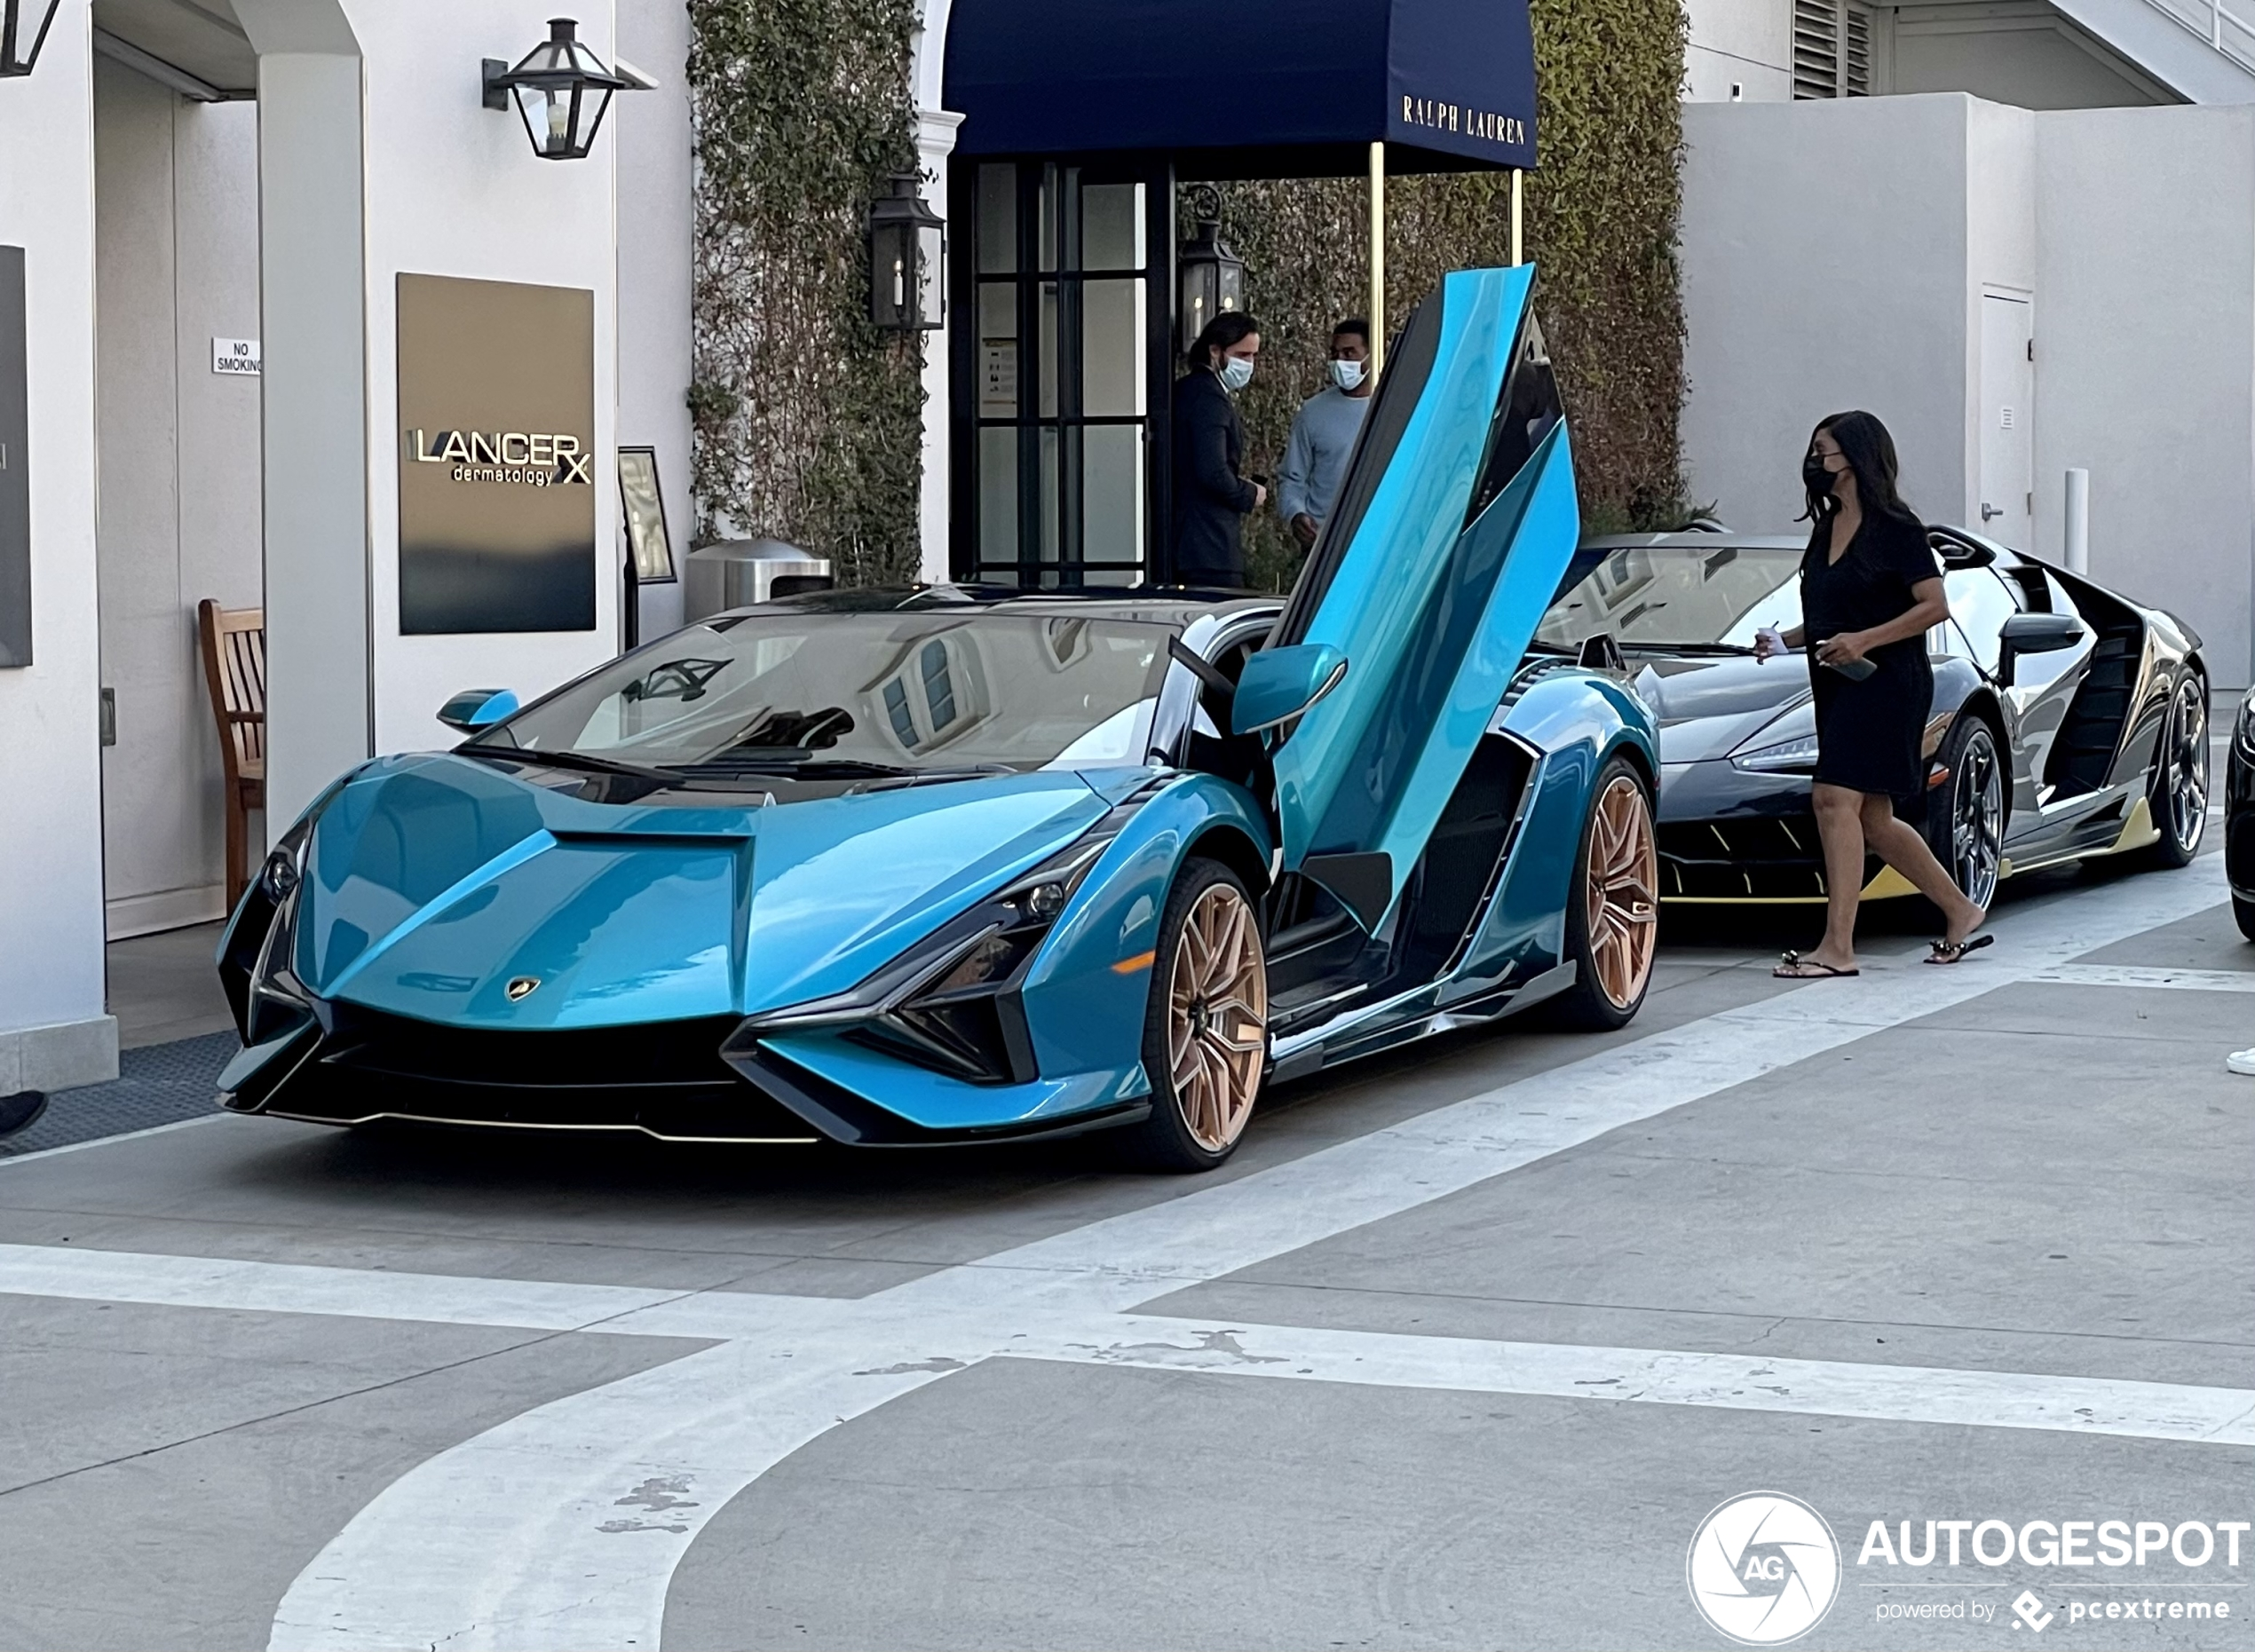 Bizarre combo shows two limited Lamborghinis